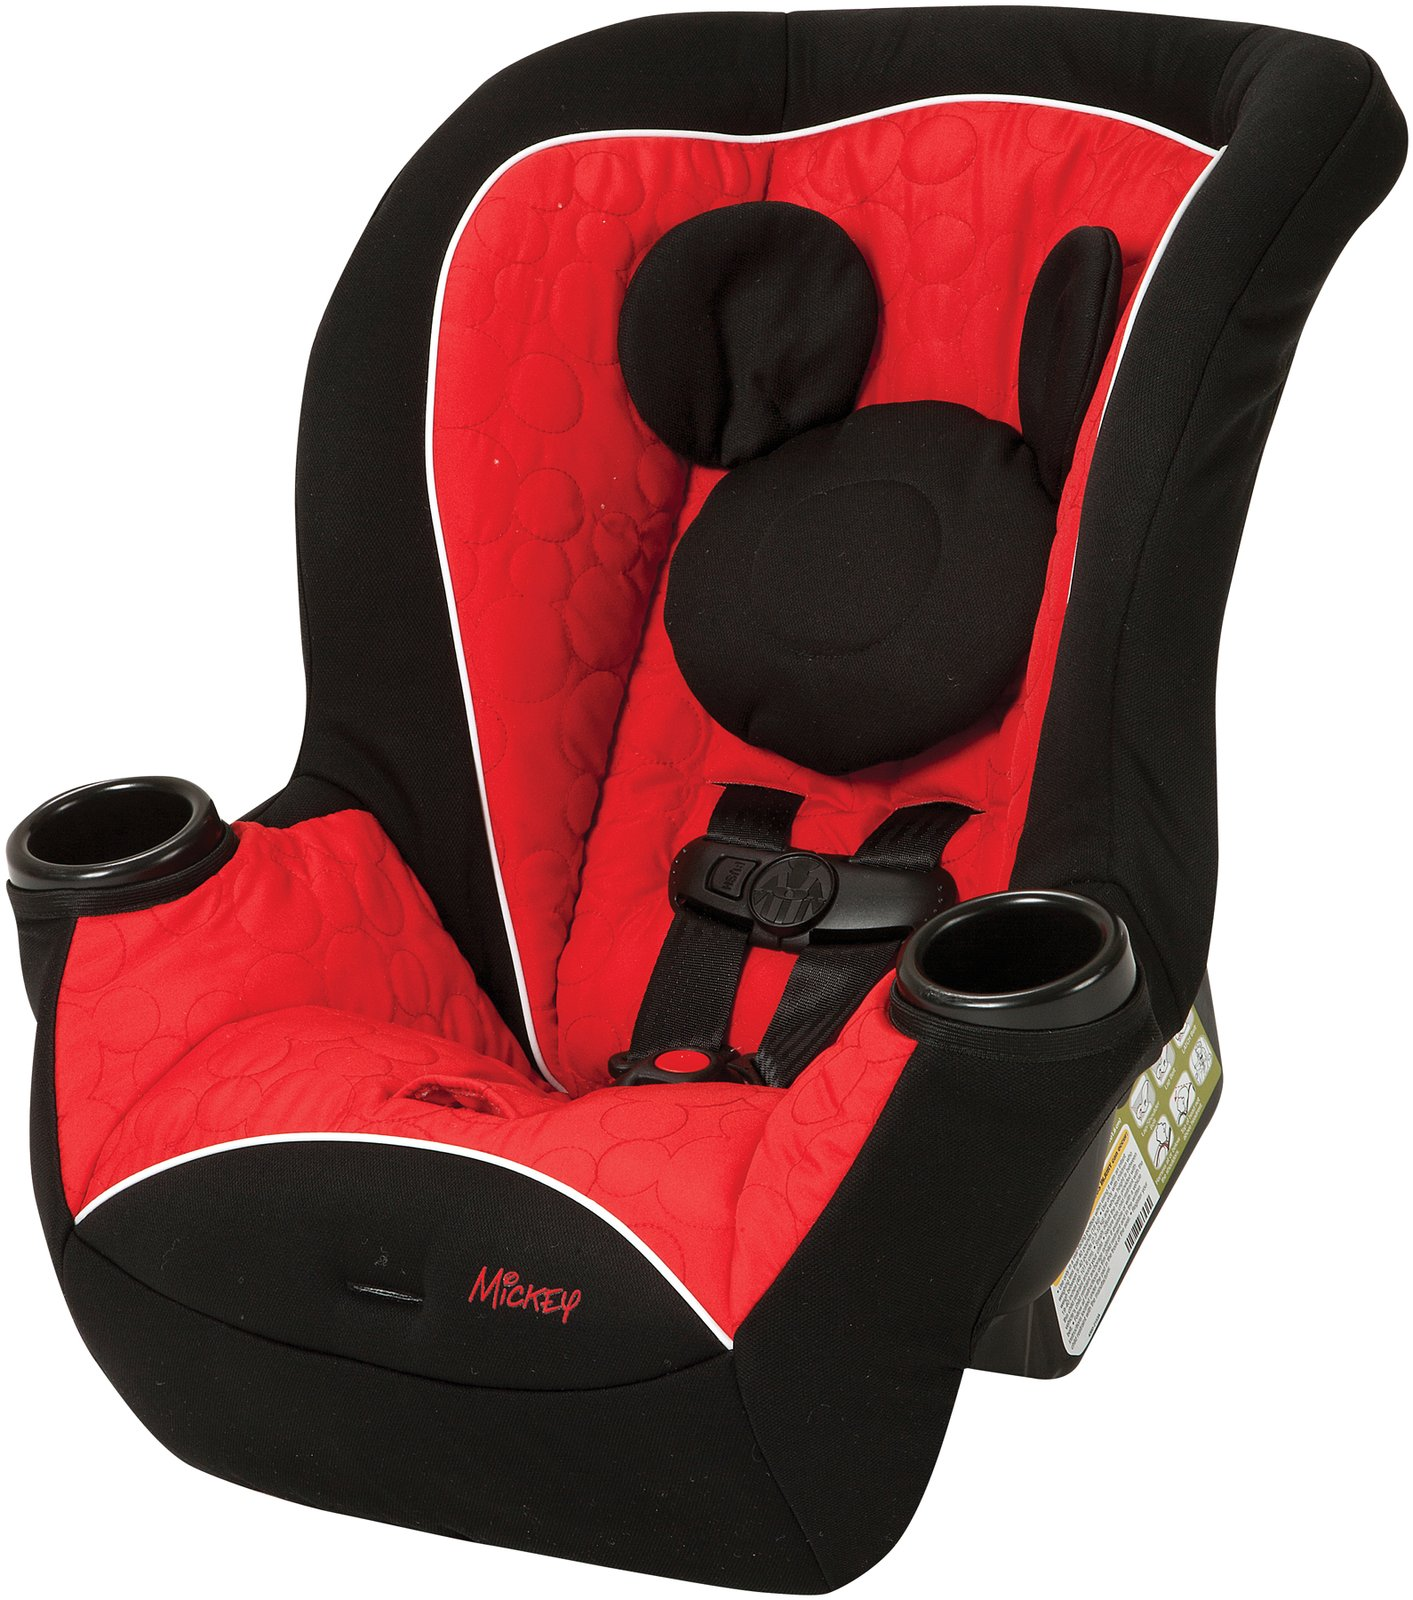 Dorel Juvenile Apt Convertible Car Seat - Mousekeeter Mickey